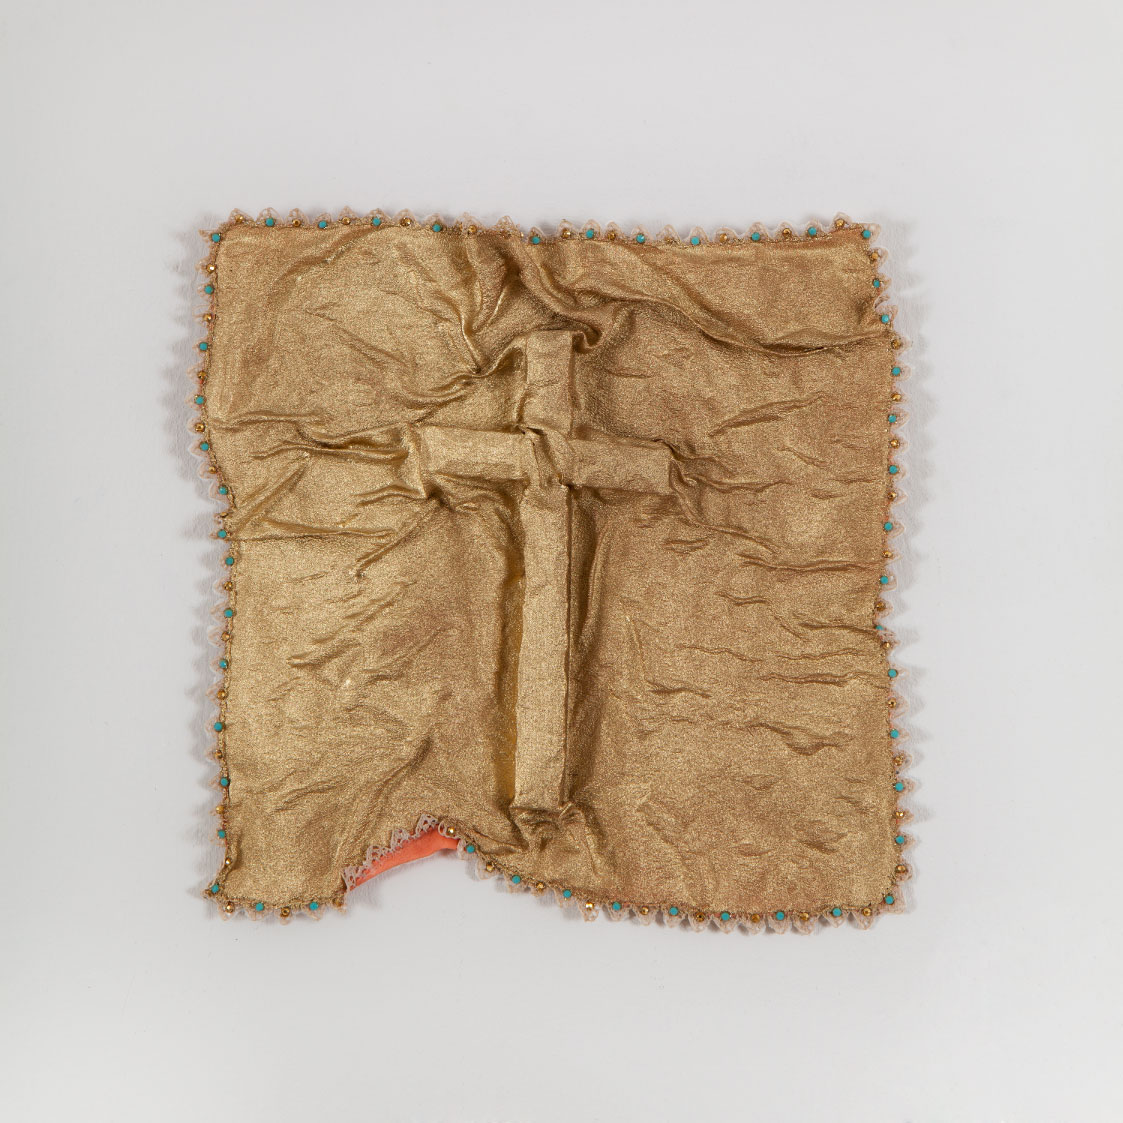 Fatma Abu Roumi, Bridal Kerchief, 2015. Cloth, wood, zircons and glue, 17 × 17 cm. Artist's collection